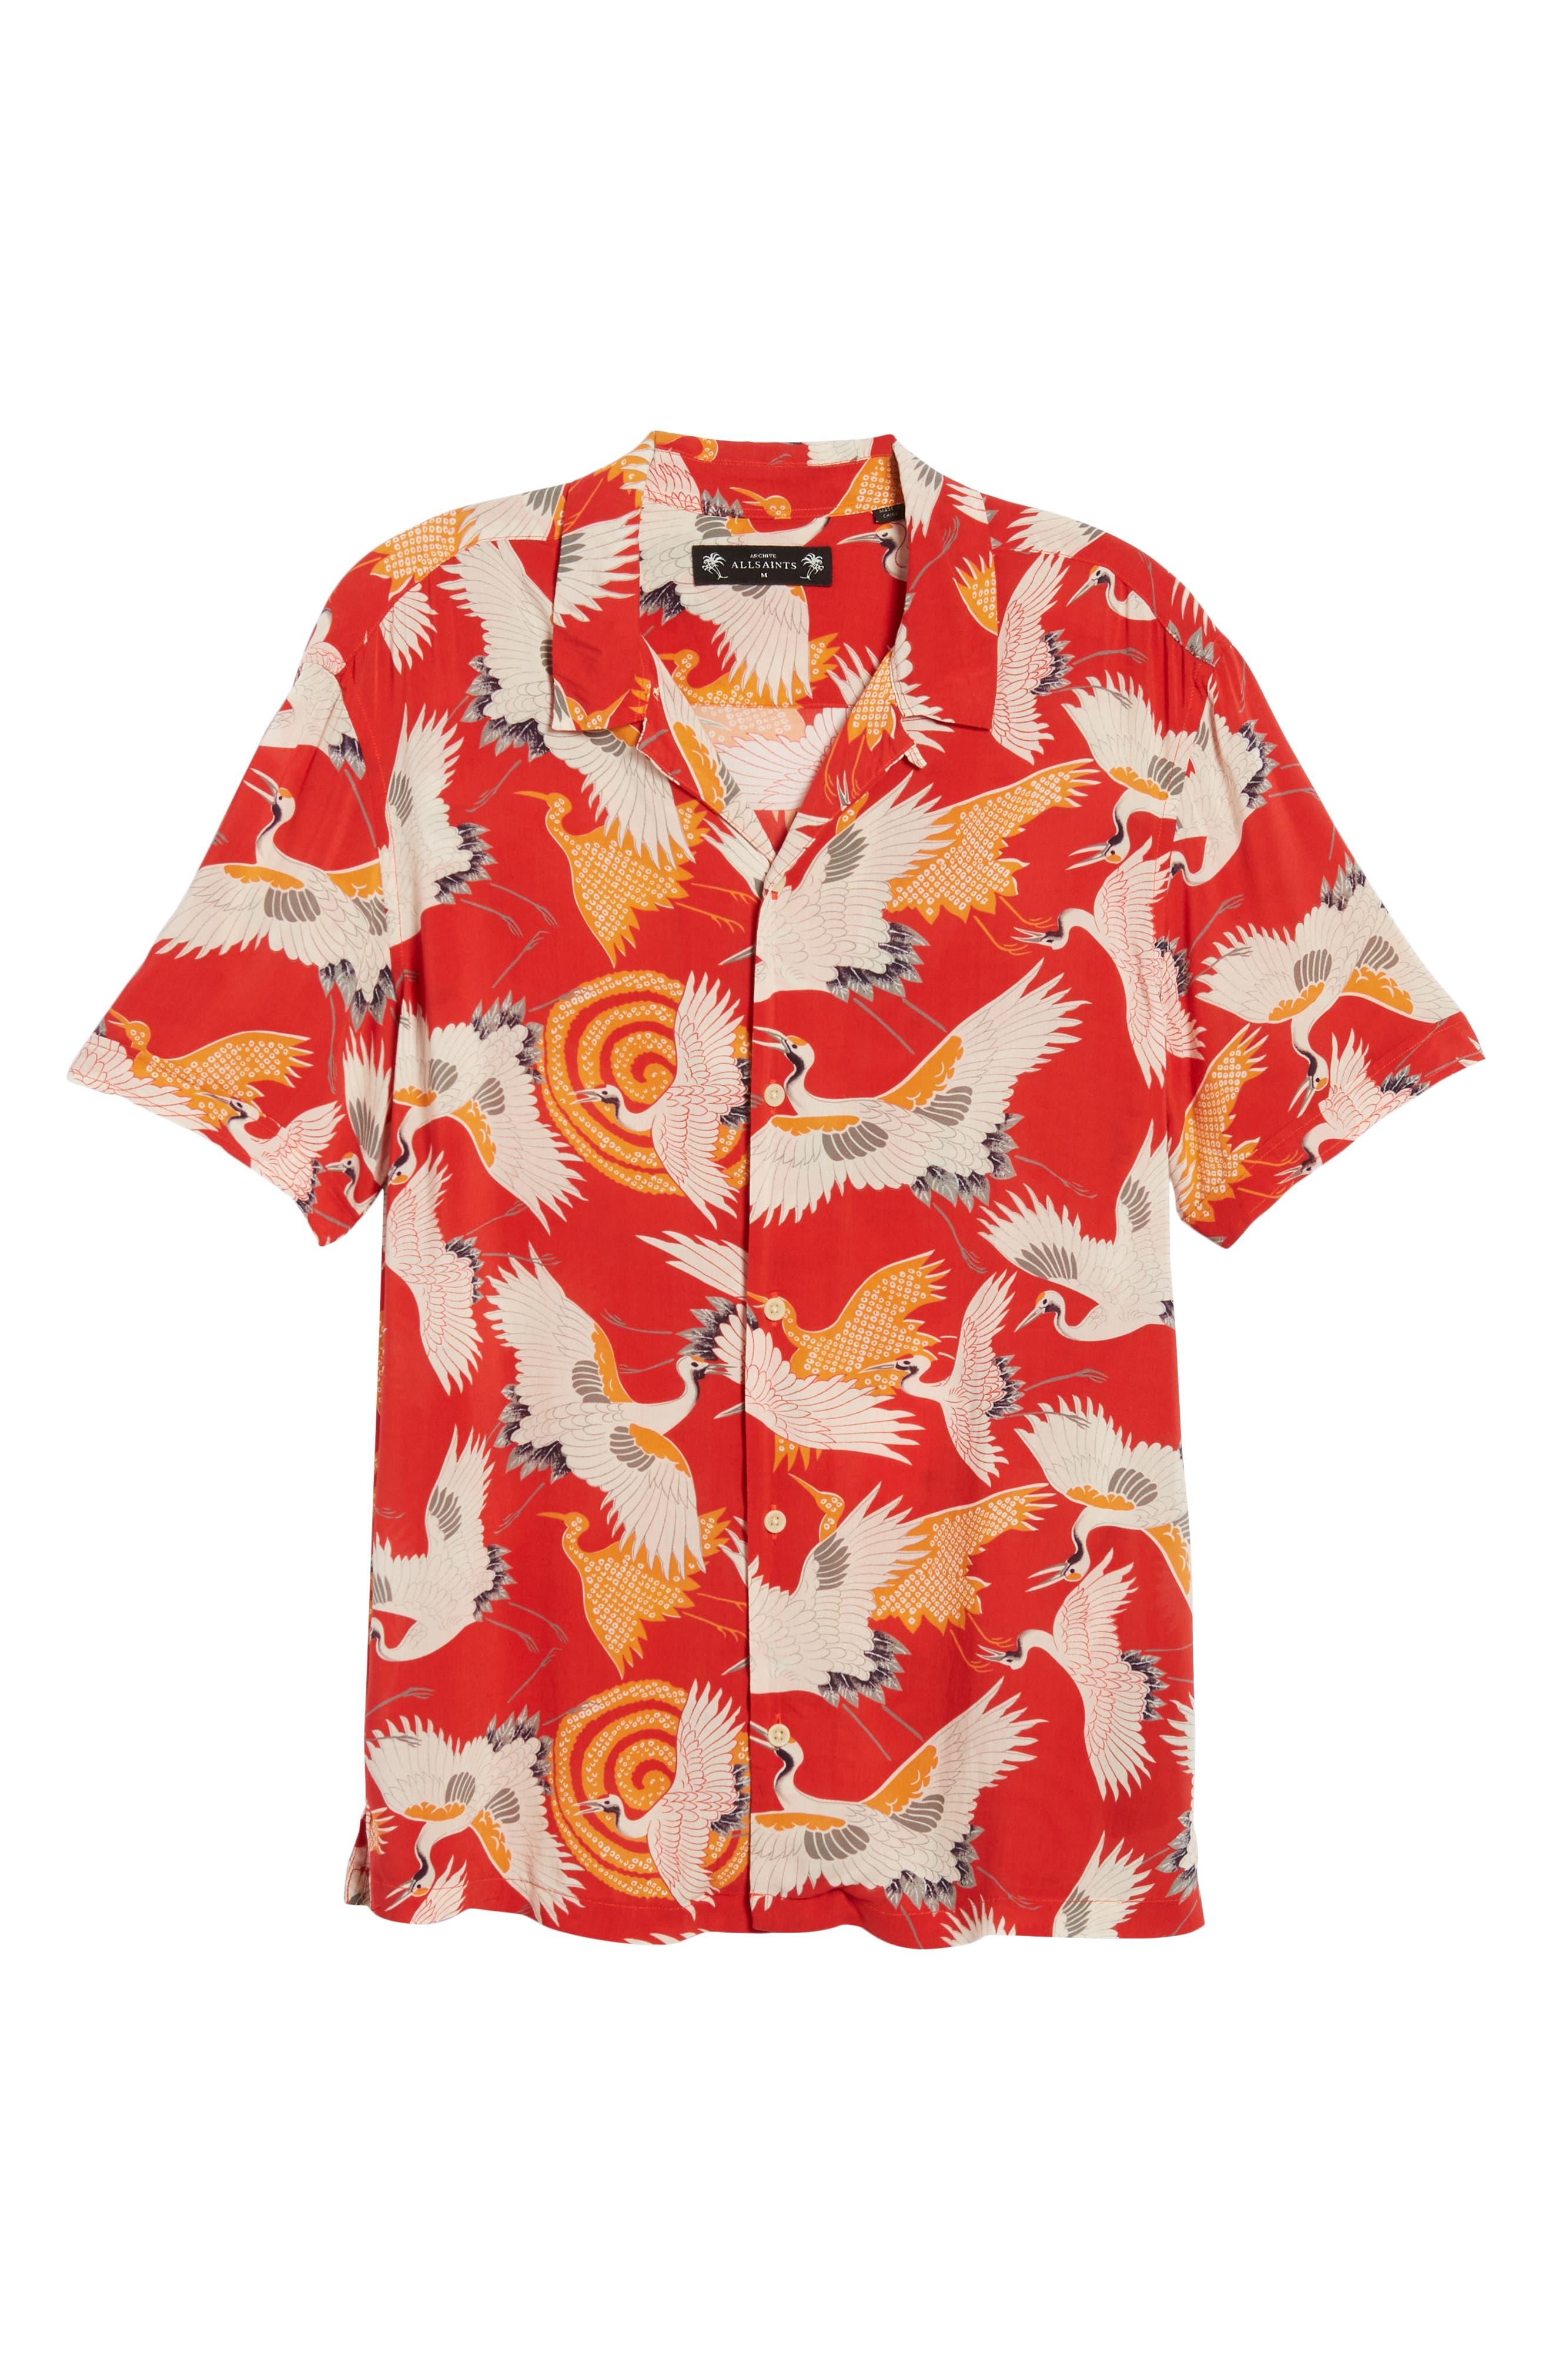 Tsuru Regular Fit Short Sleeve Sport Shirt,                             Alternate thumbnail 6, color,                             Red